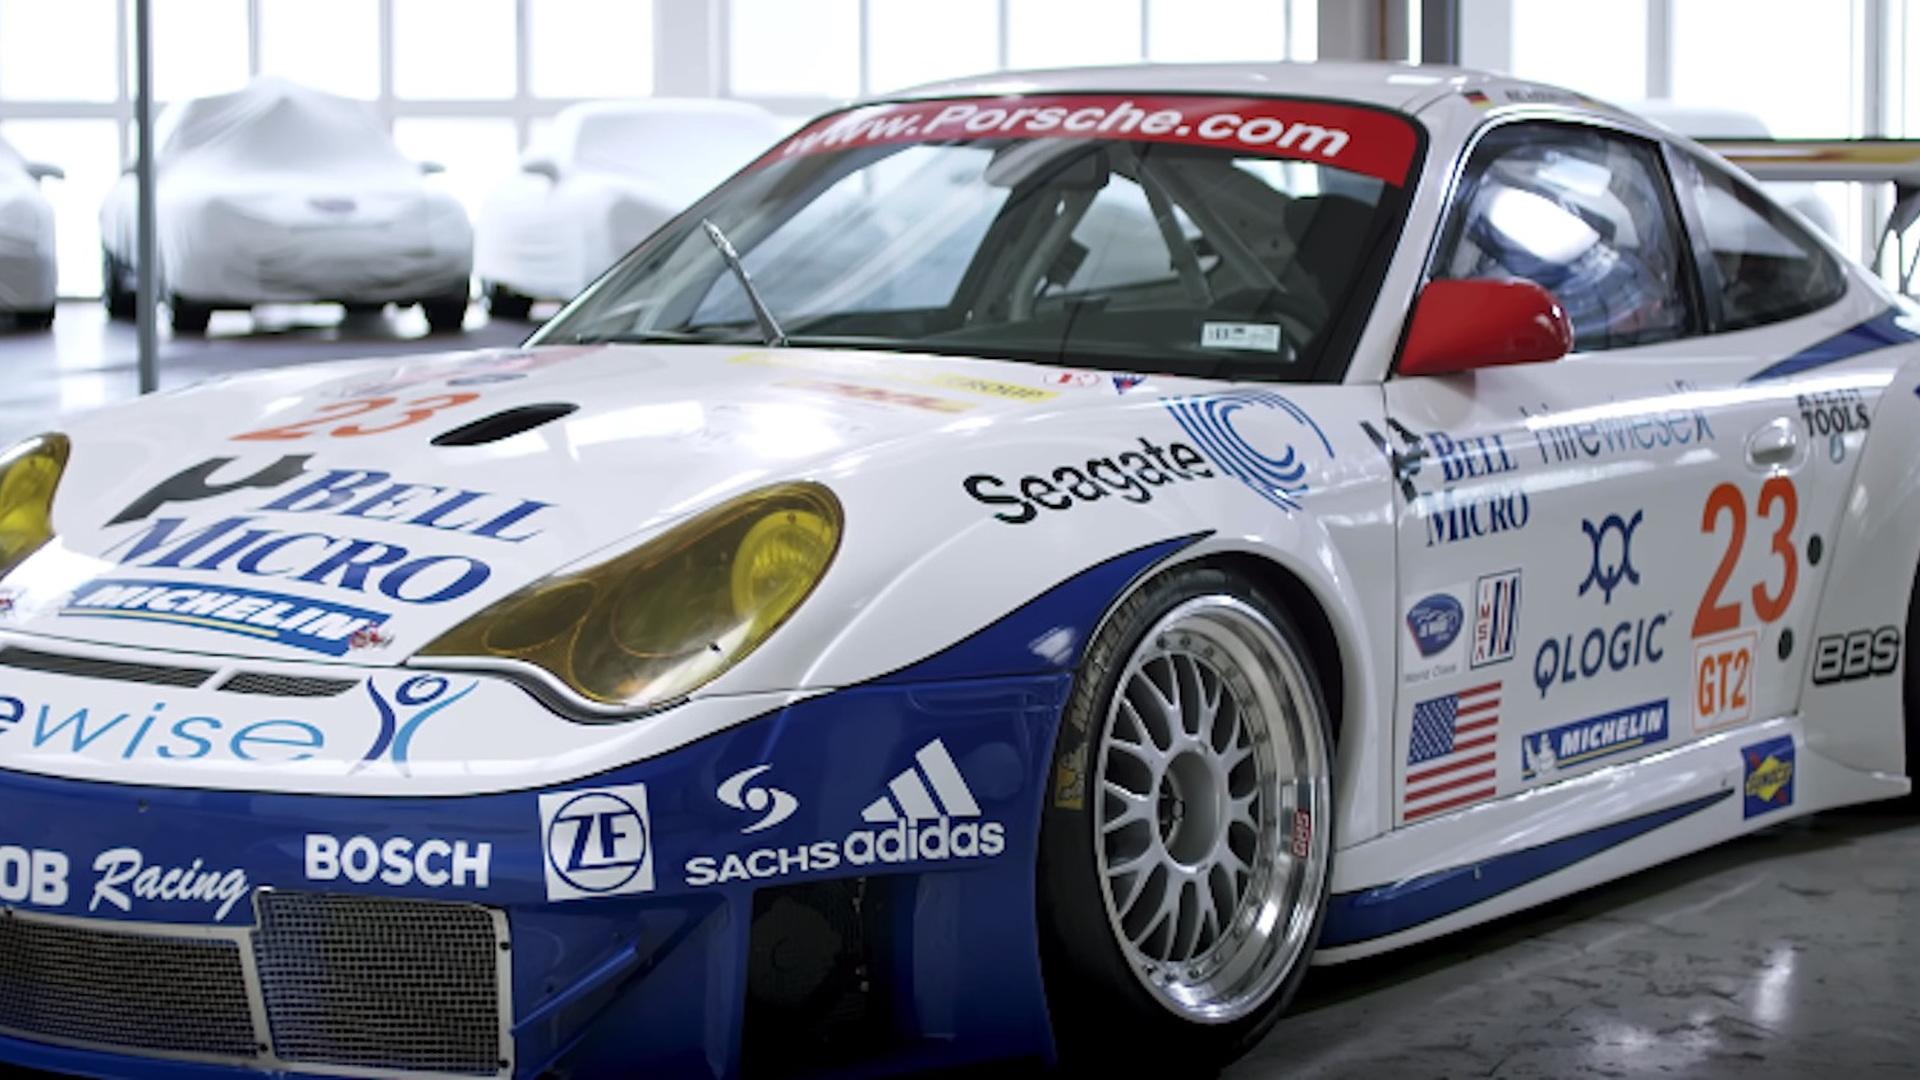 996-generation 911 RSR race car